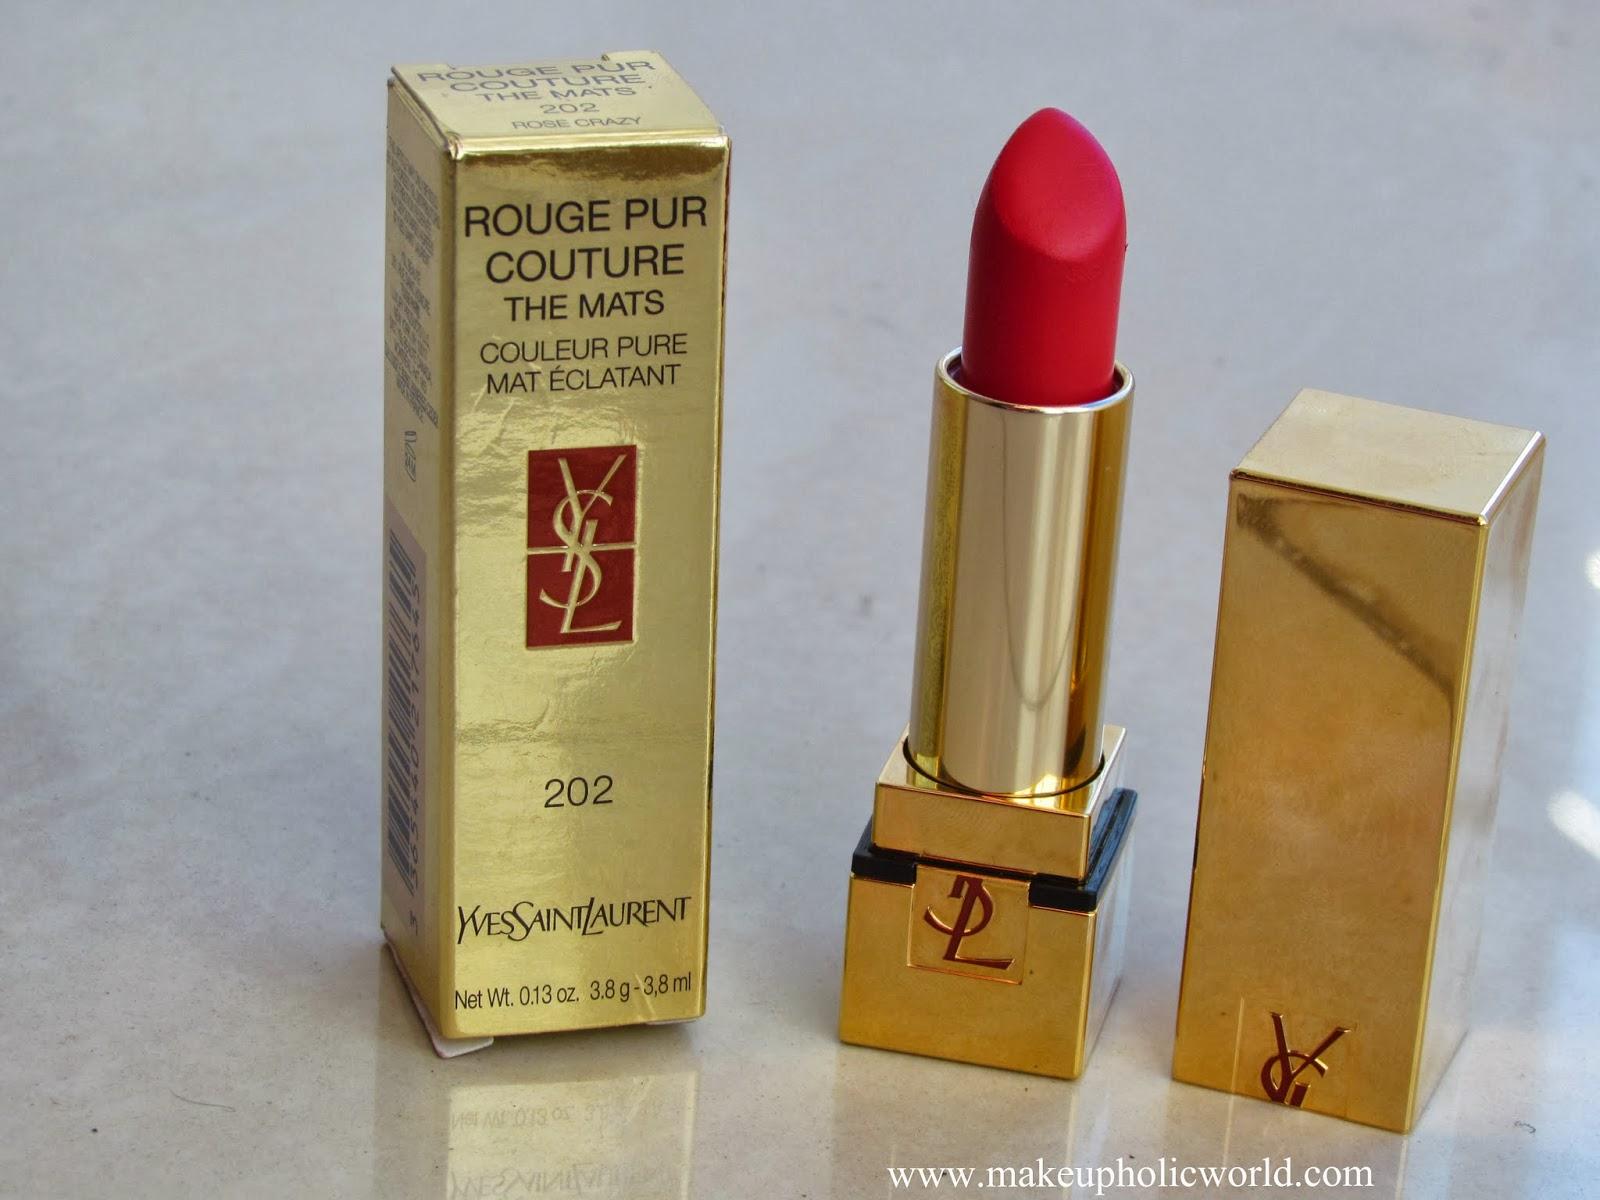 Yves Saint Laurent Rouge Pur Couture The Mats Lipstick